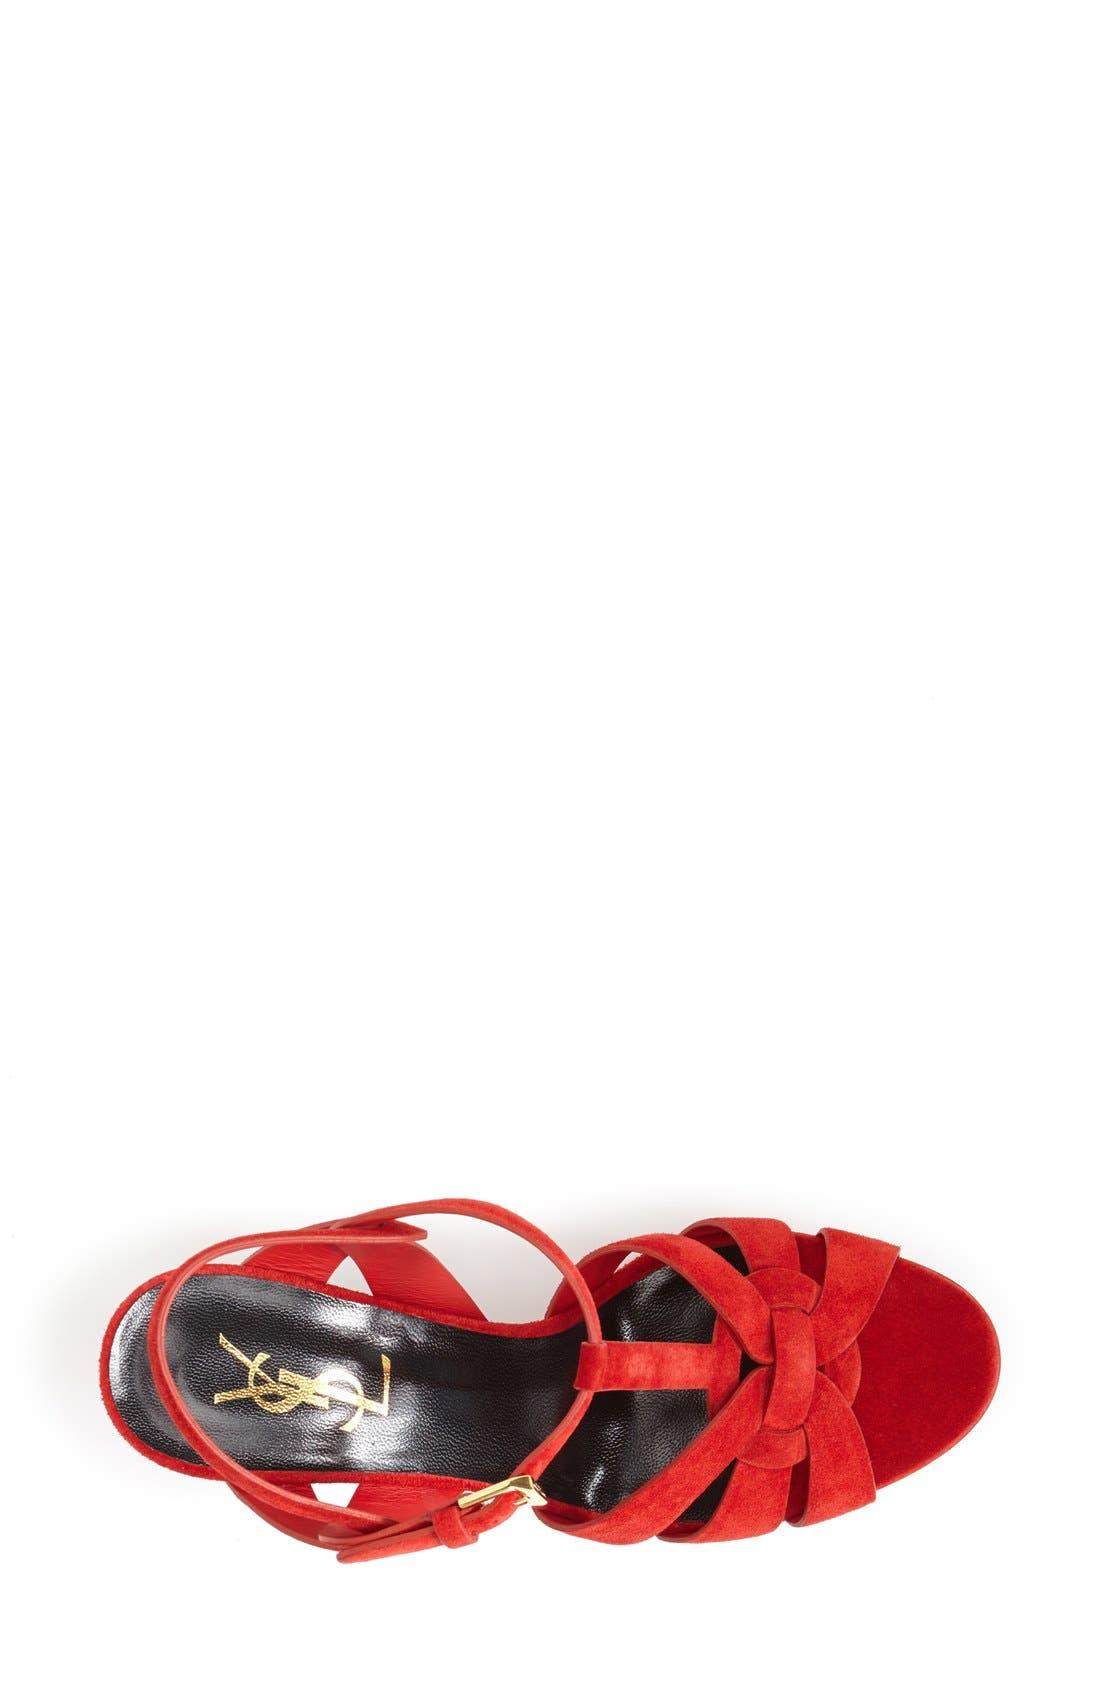 Alternate Image 3  - Saint Laurent 'Tribute' Suede Sandal (Women)